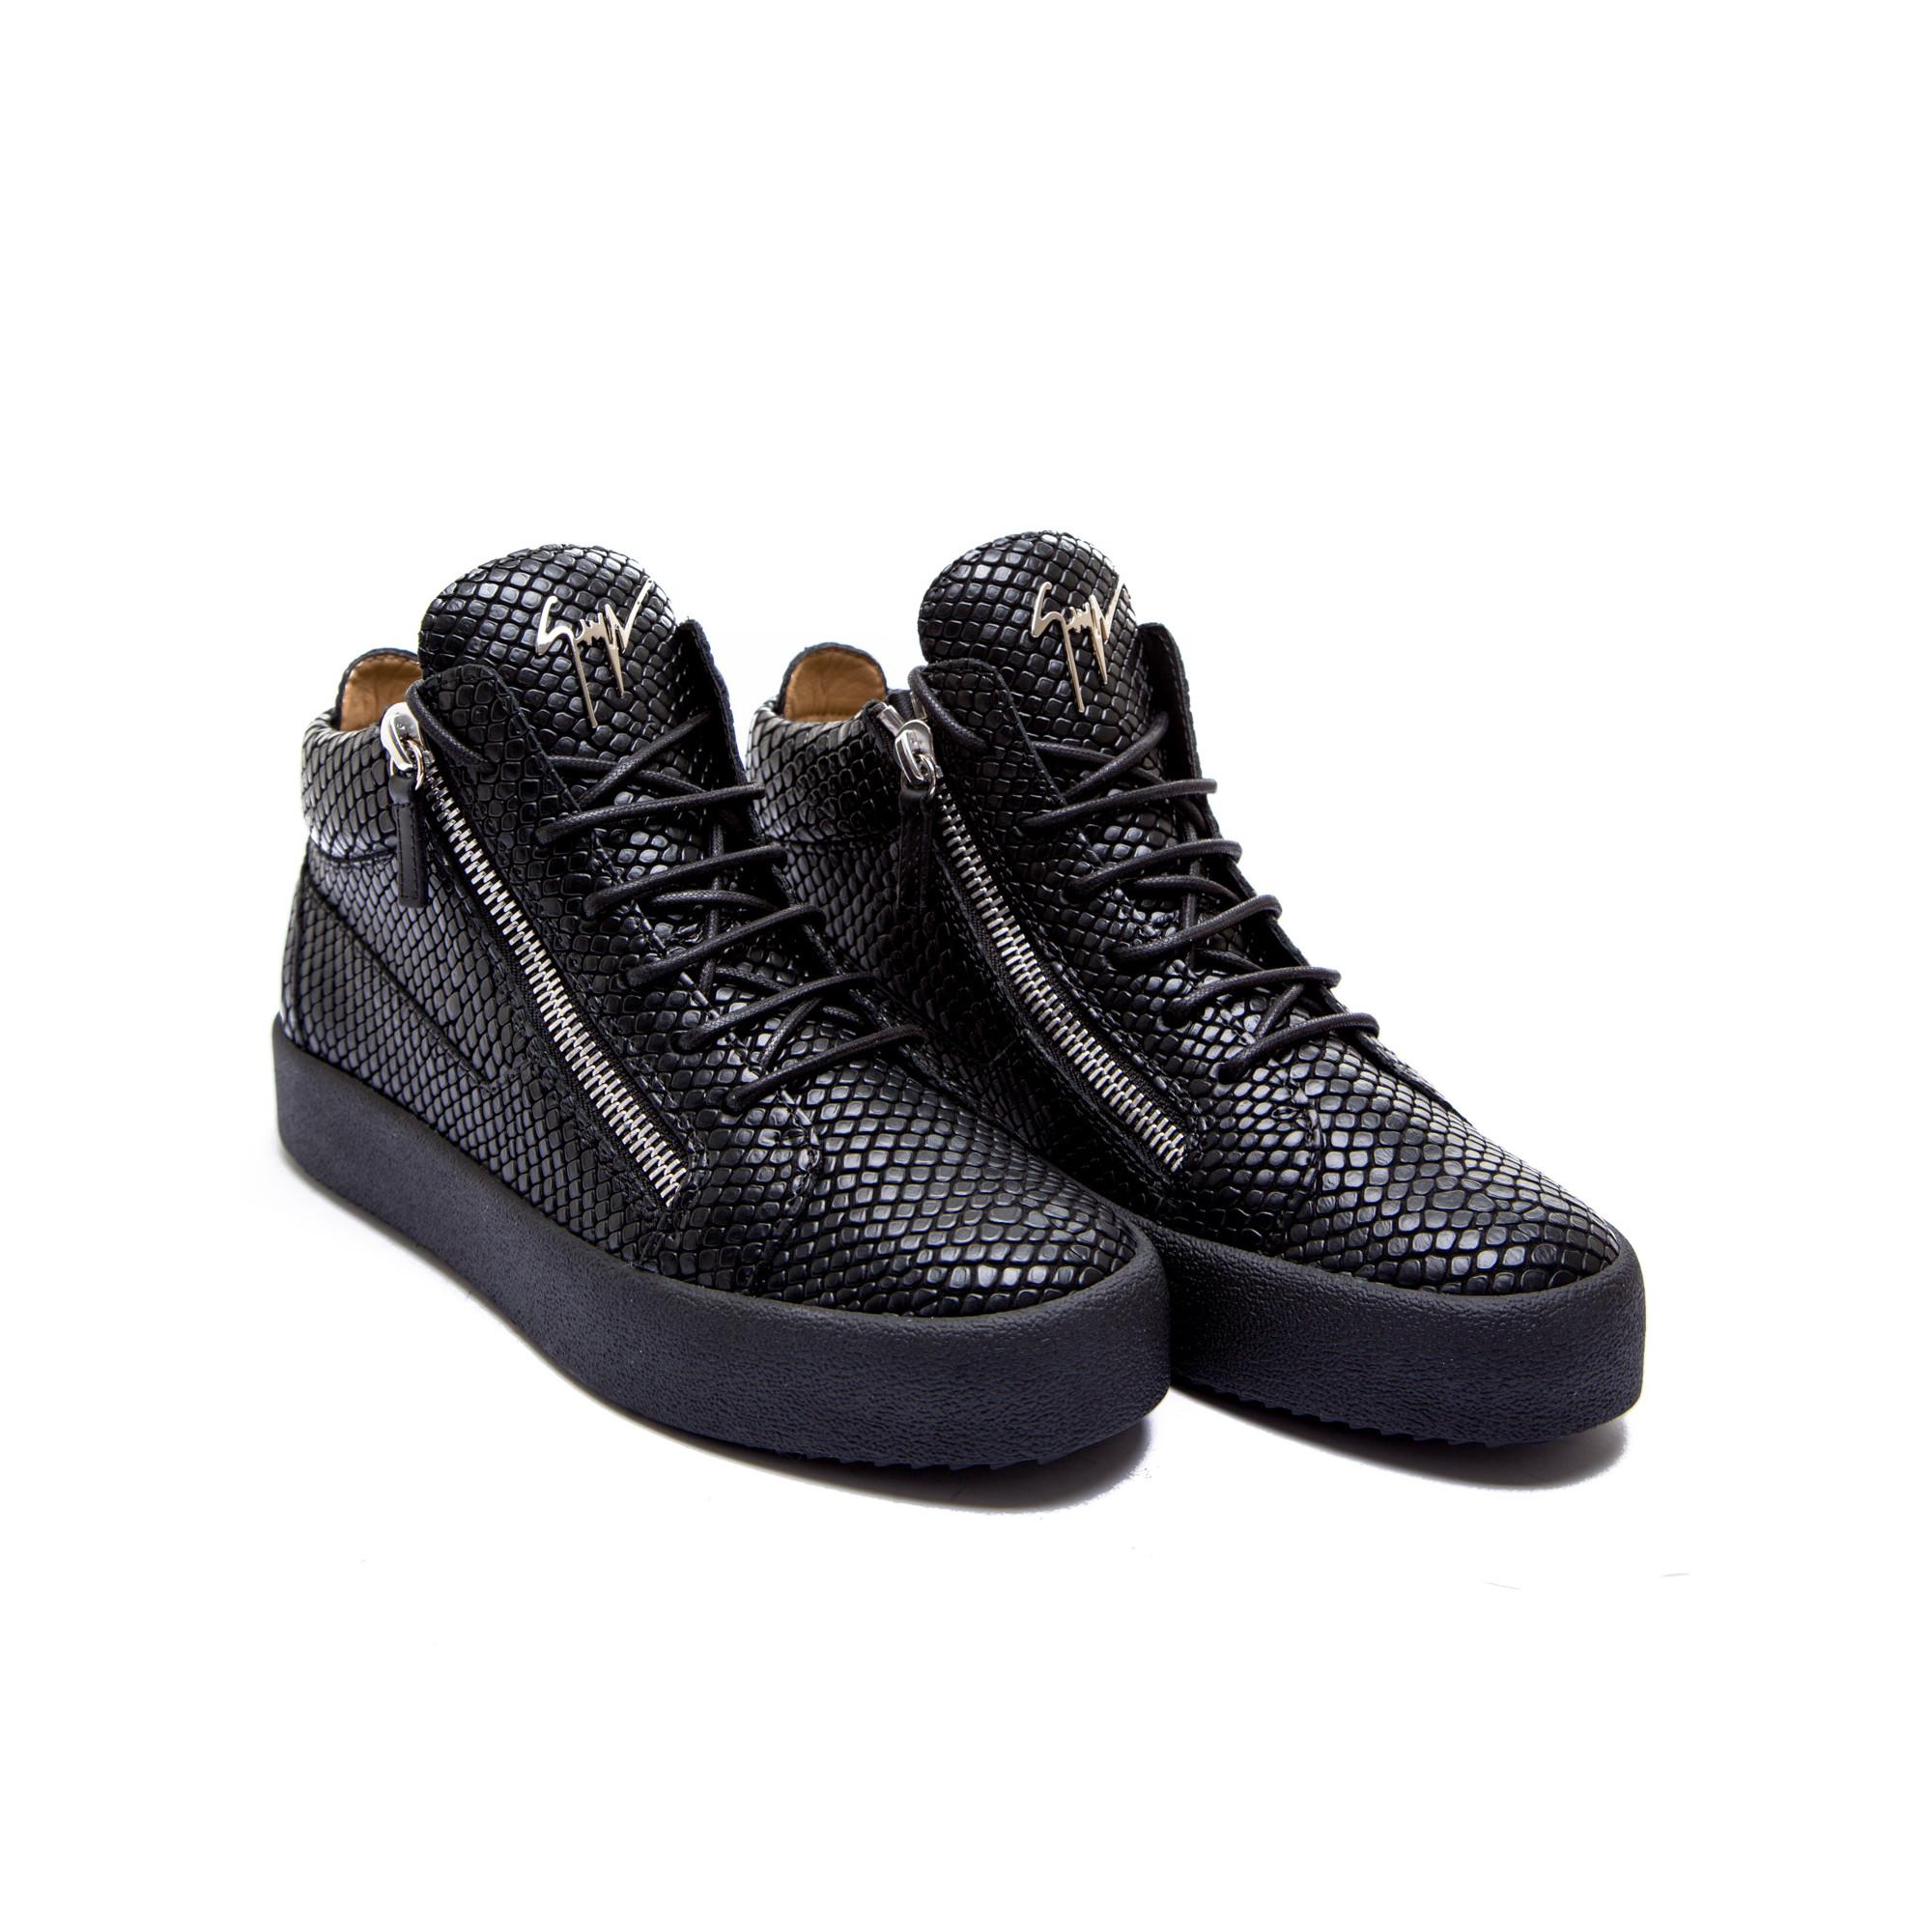 24ae5c5994d81 Giuseppe Zanotti Blue Suede Heels Tumblr Sneaker Sale For Men ...